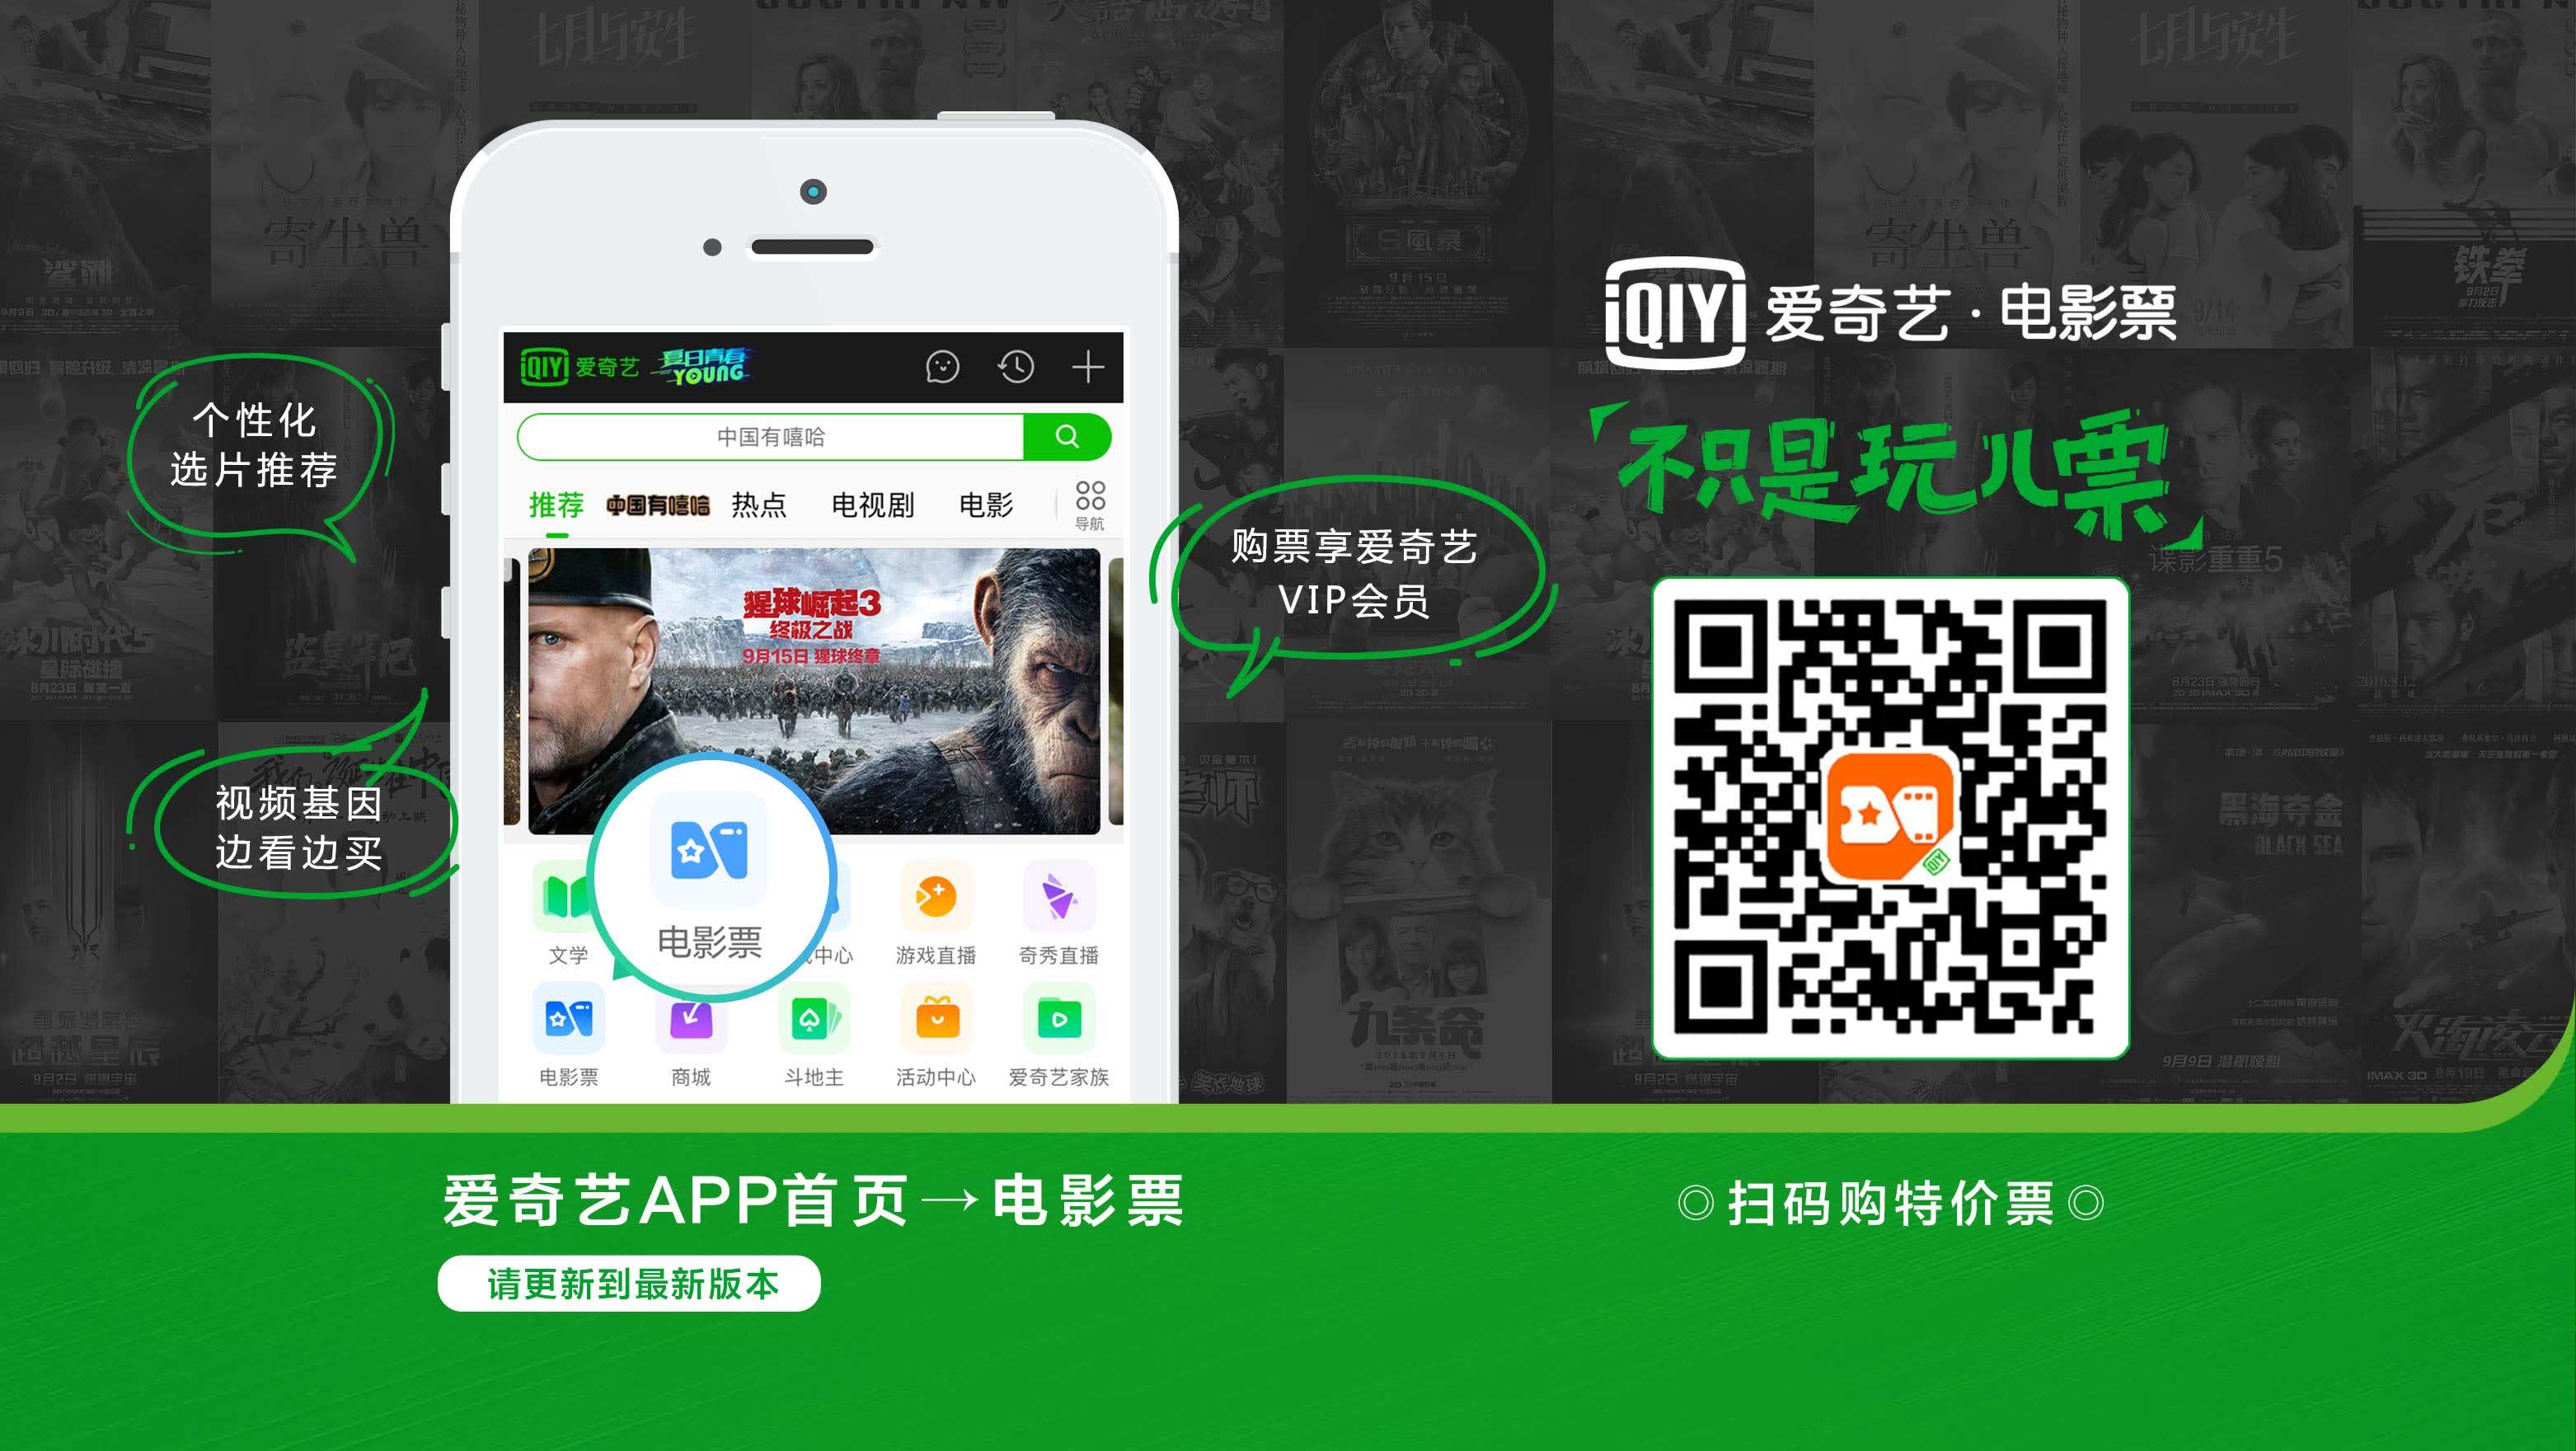 A phone screen showing the iQiyi app.